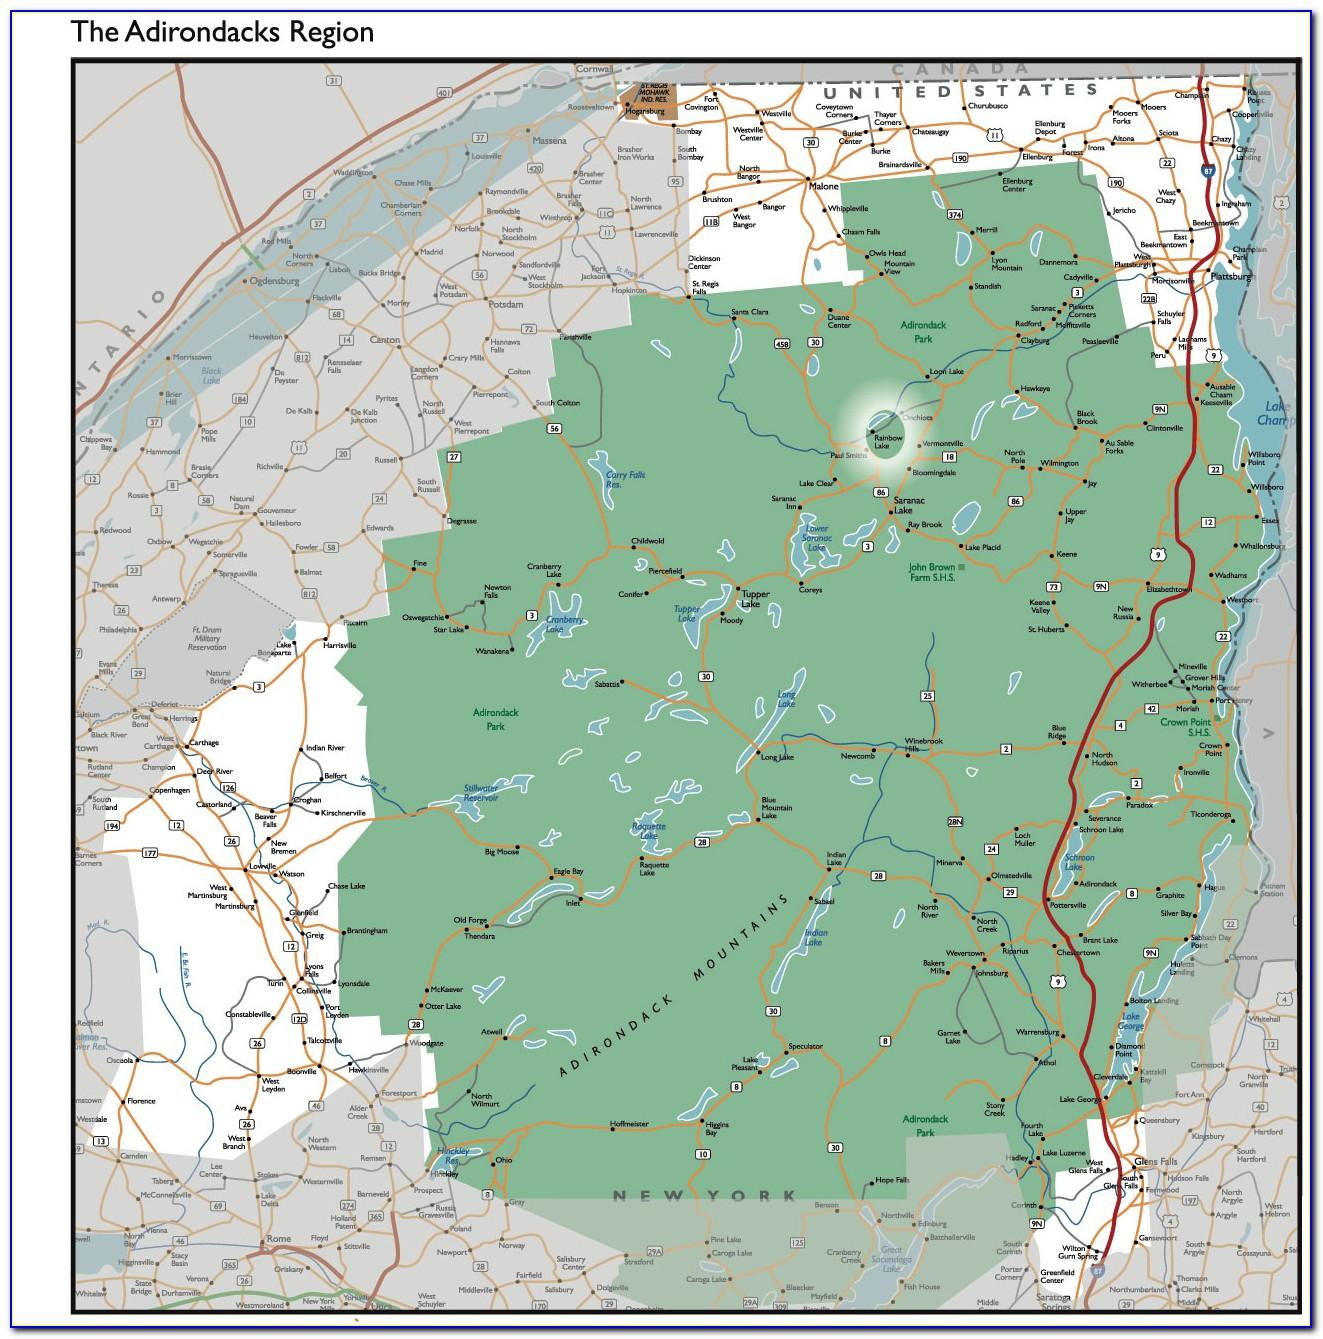 Maps Of The Adirondacks